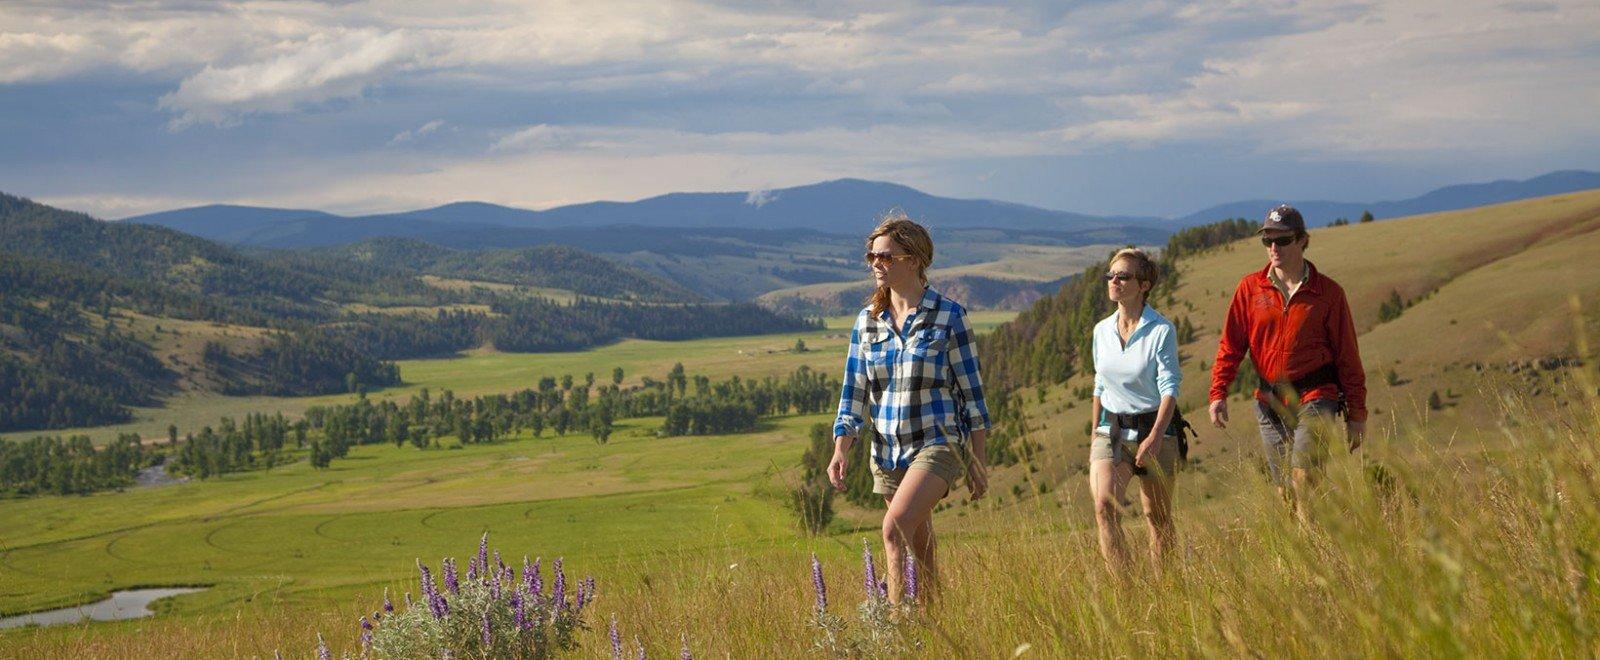 Montana Adventure  Hiking  The Ranch at Rock Creek